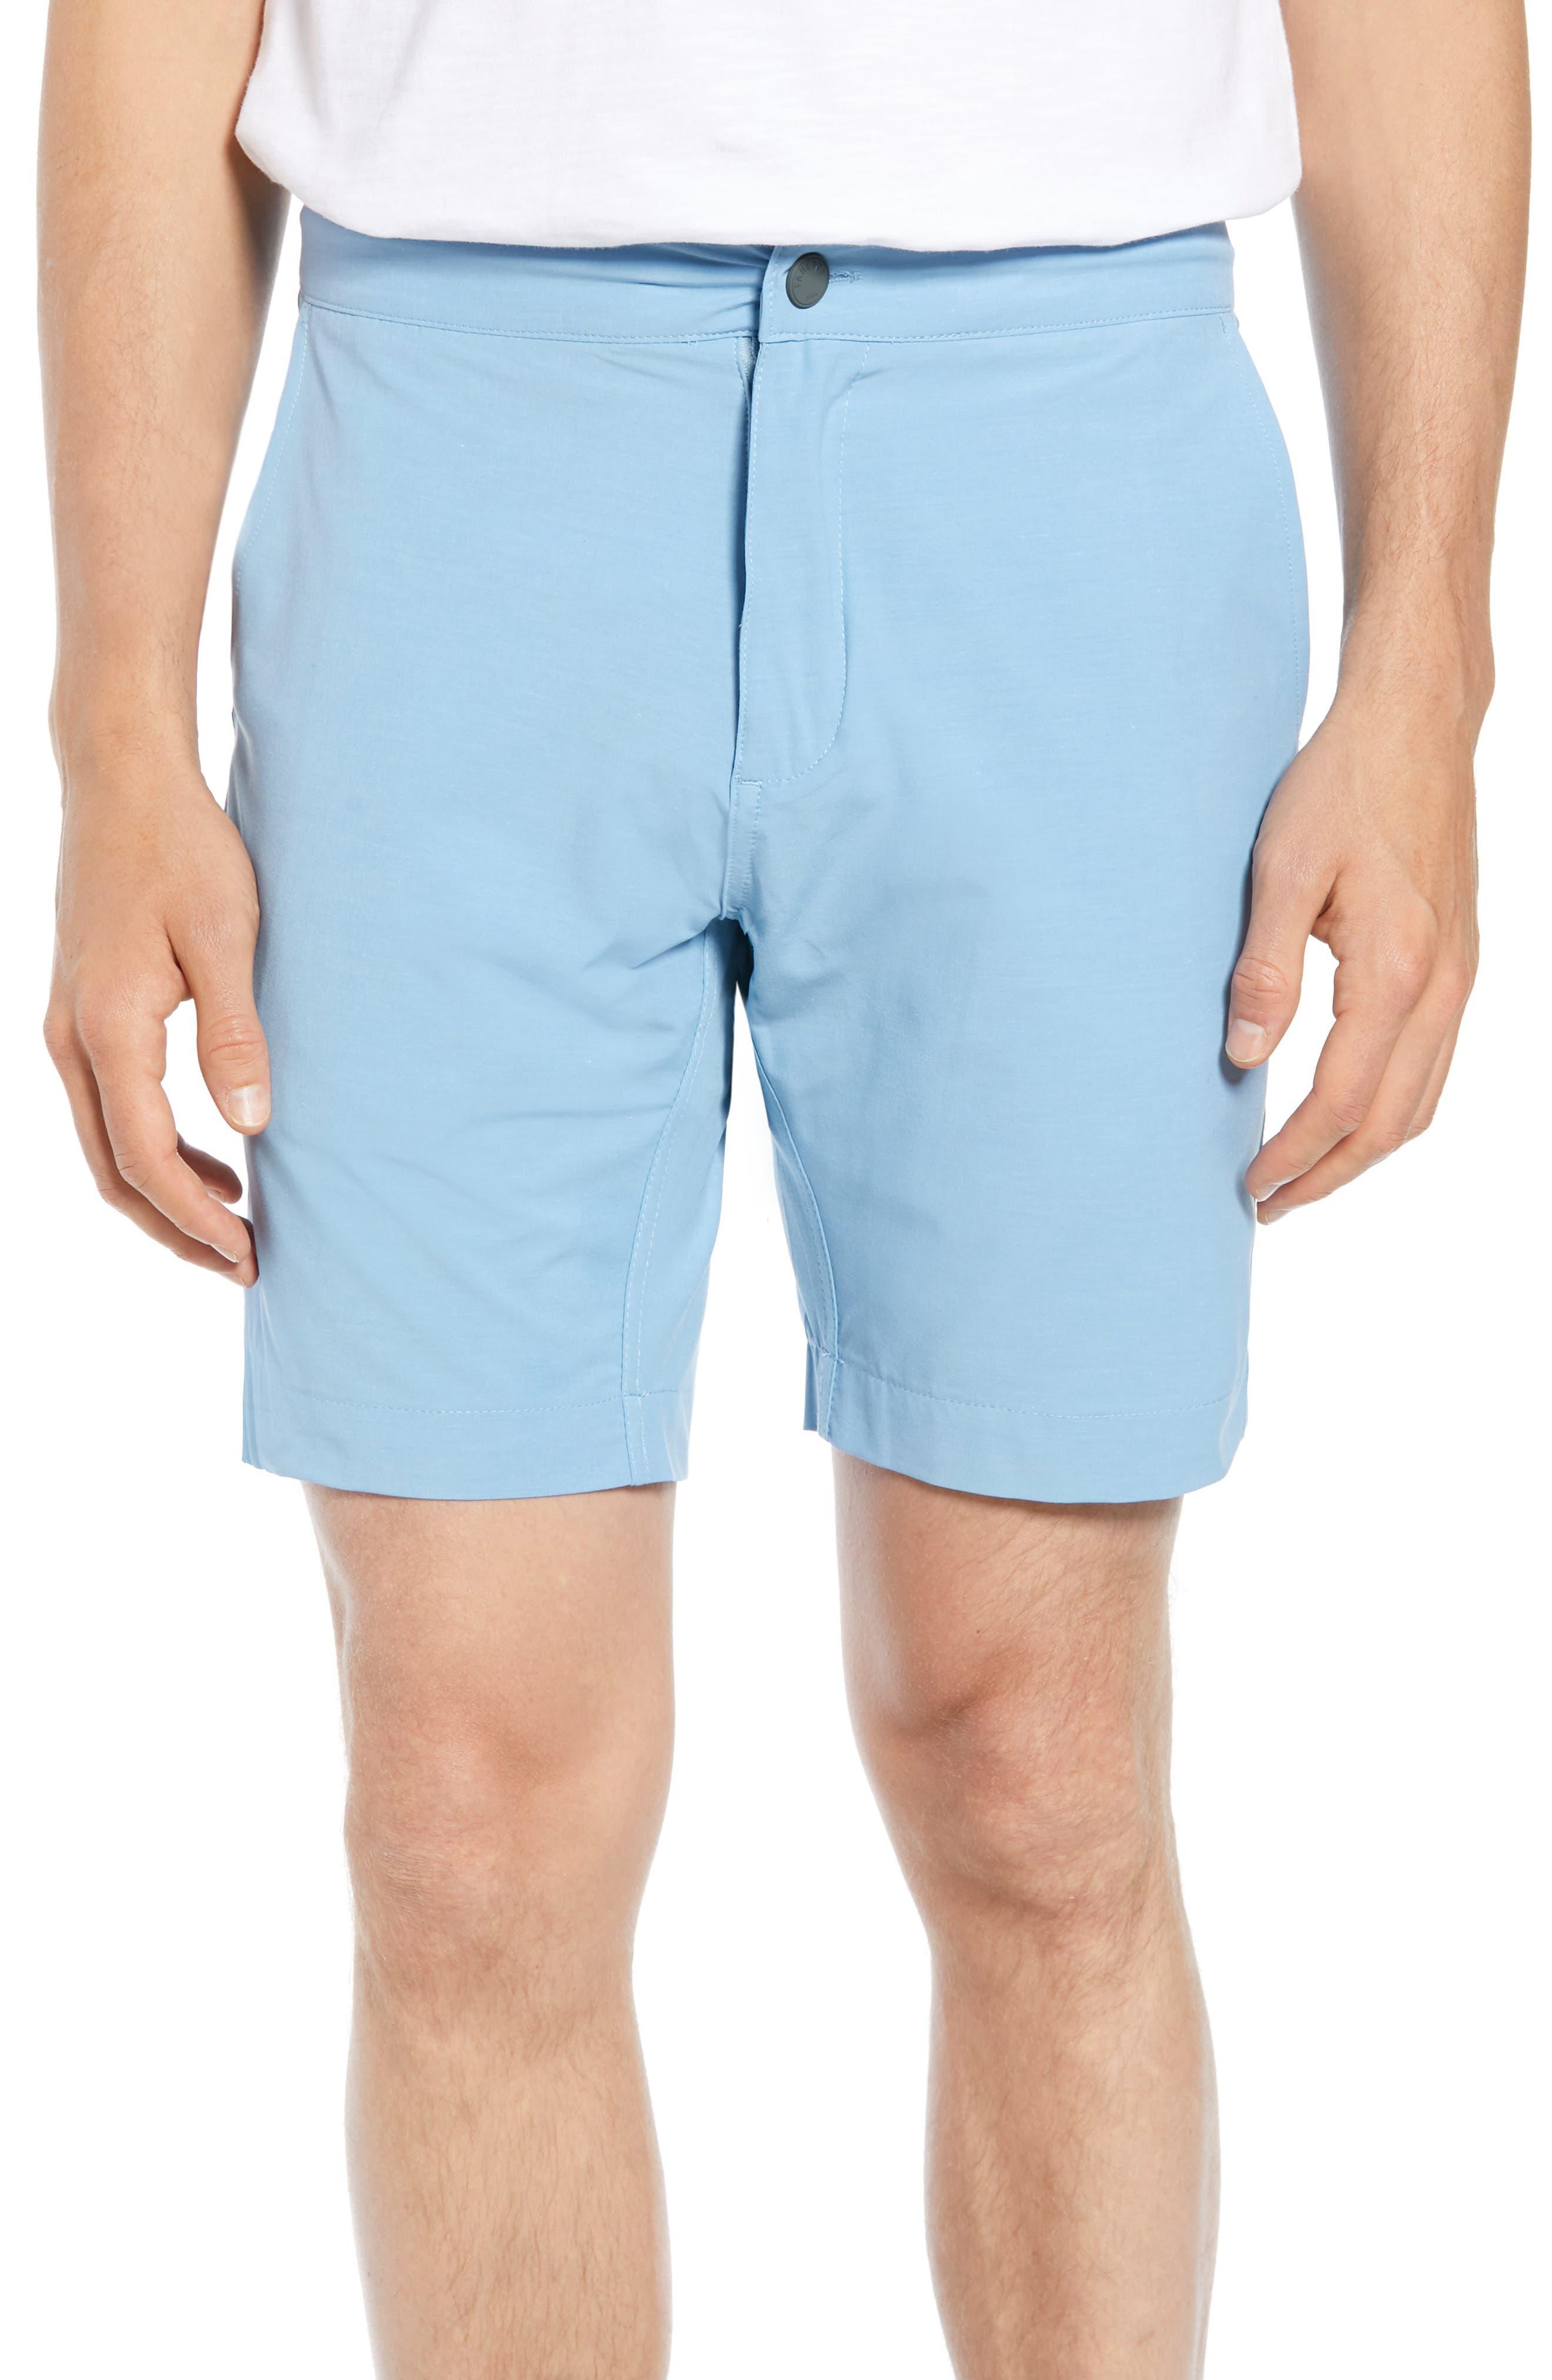 All Day Flat Front Shorts,                         Main,                         color, COASTAL BLUE